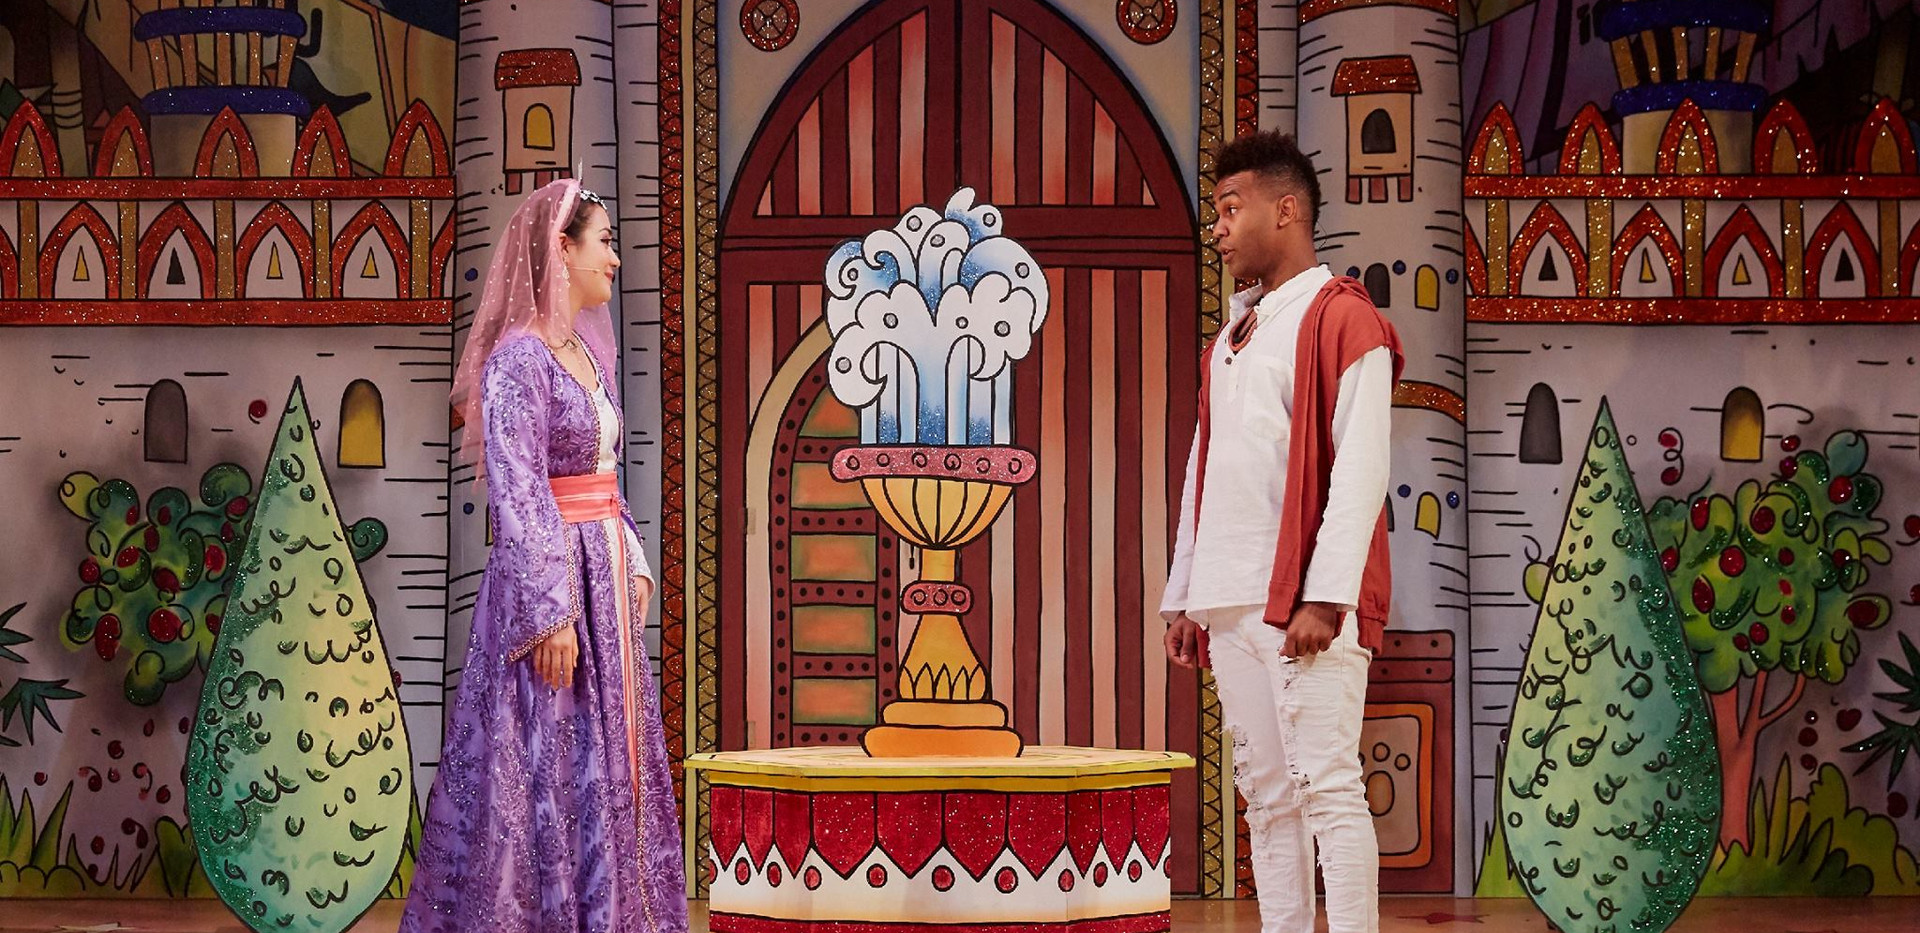 Aladdin, Watford Palace Theatre, 2017. P